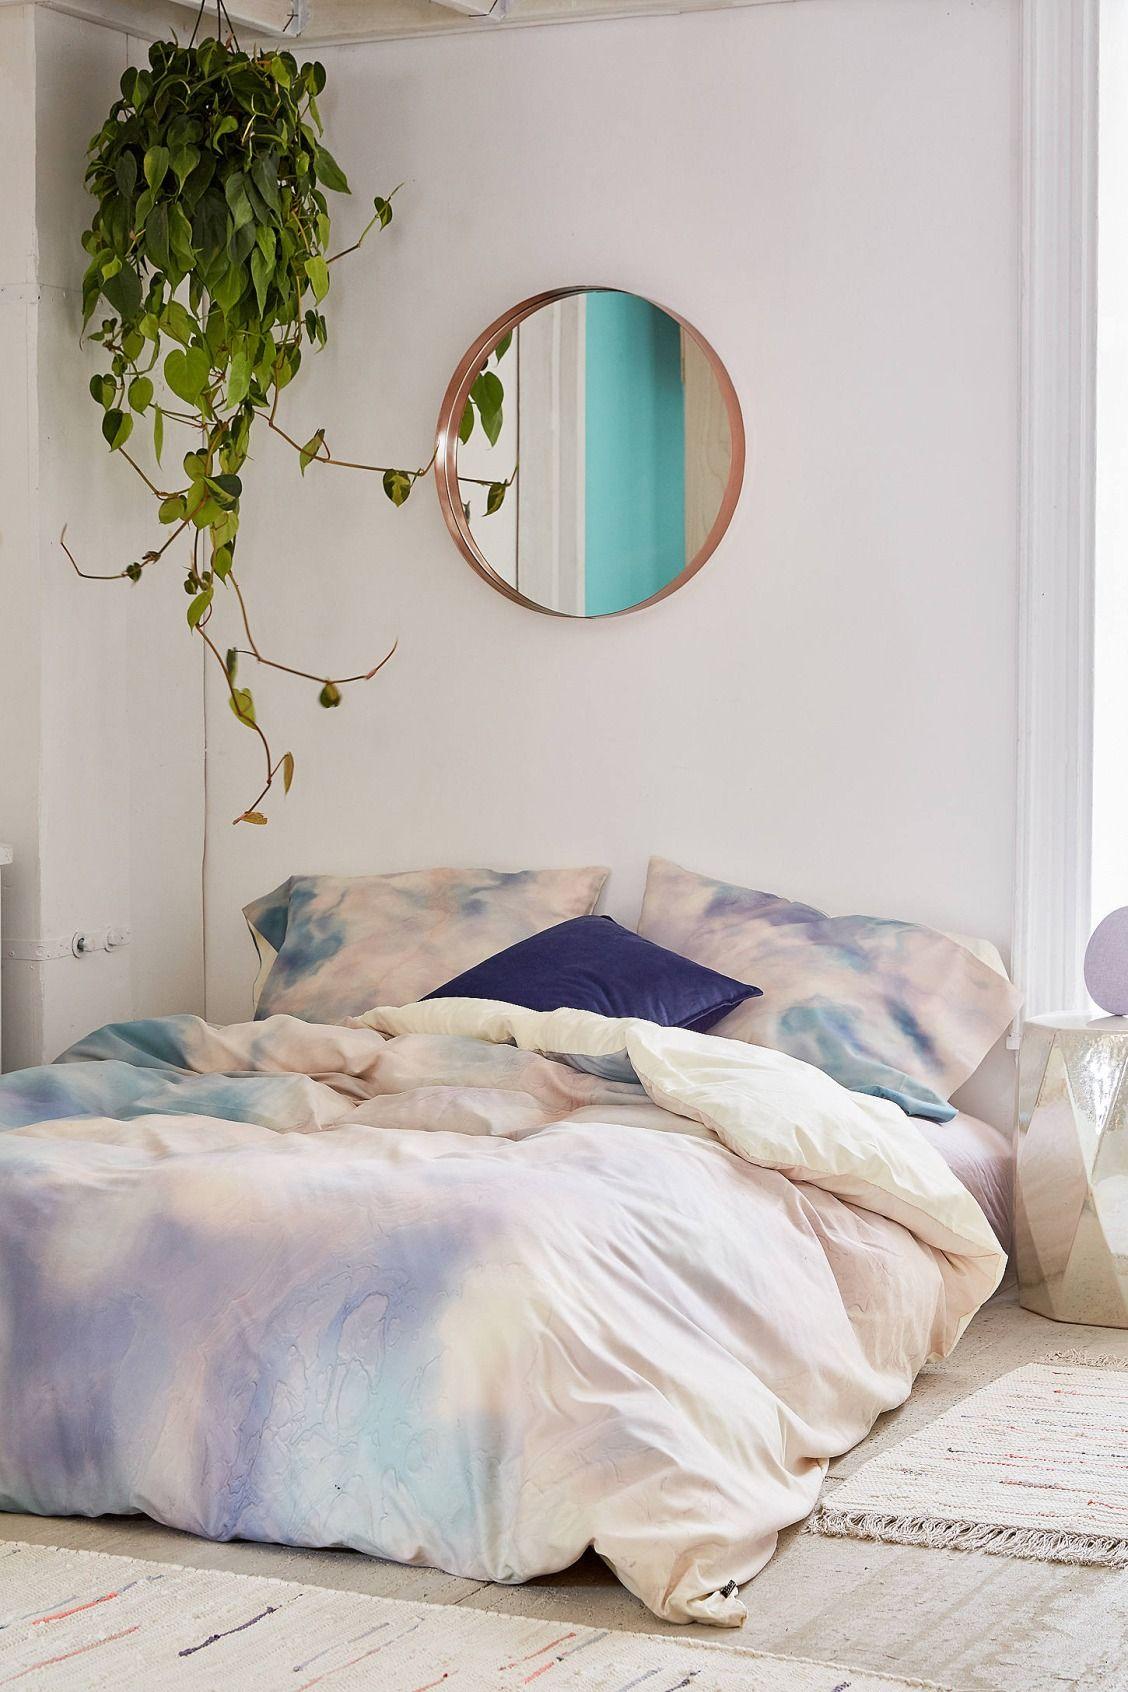 Slide View 1 Chelsea Victoria For Deny Unicorn Marble Duvet Cover Marble Duvet Cover Simple Bedroom Decor Bedroom Decor